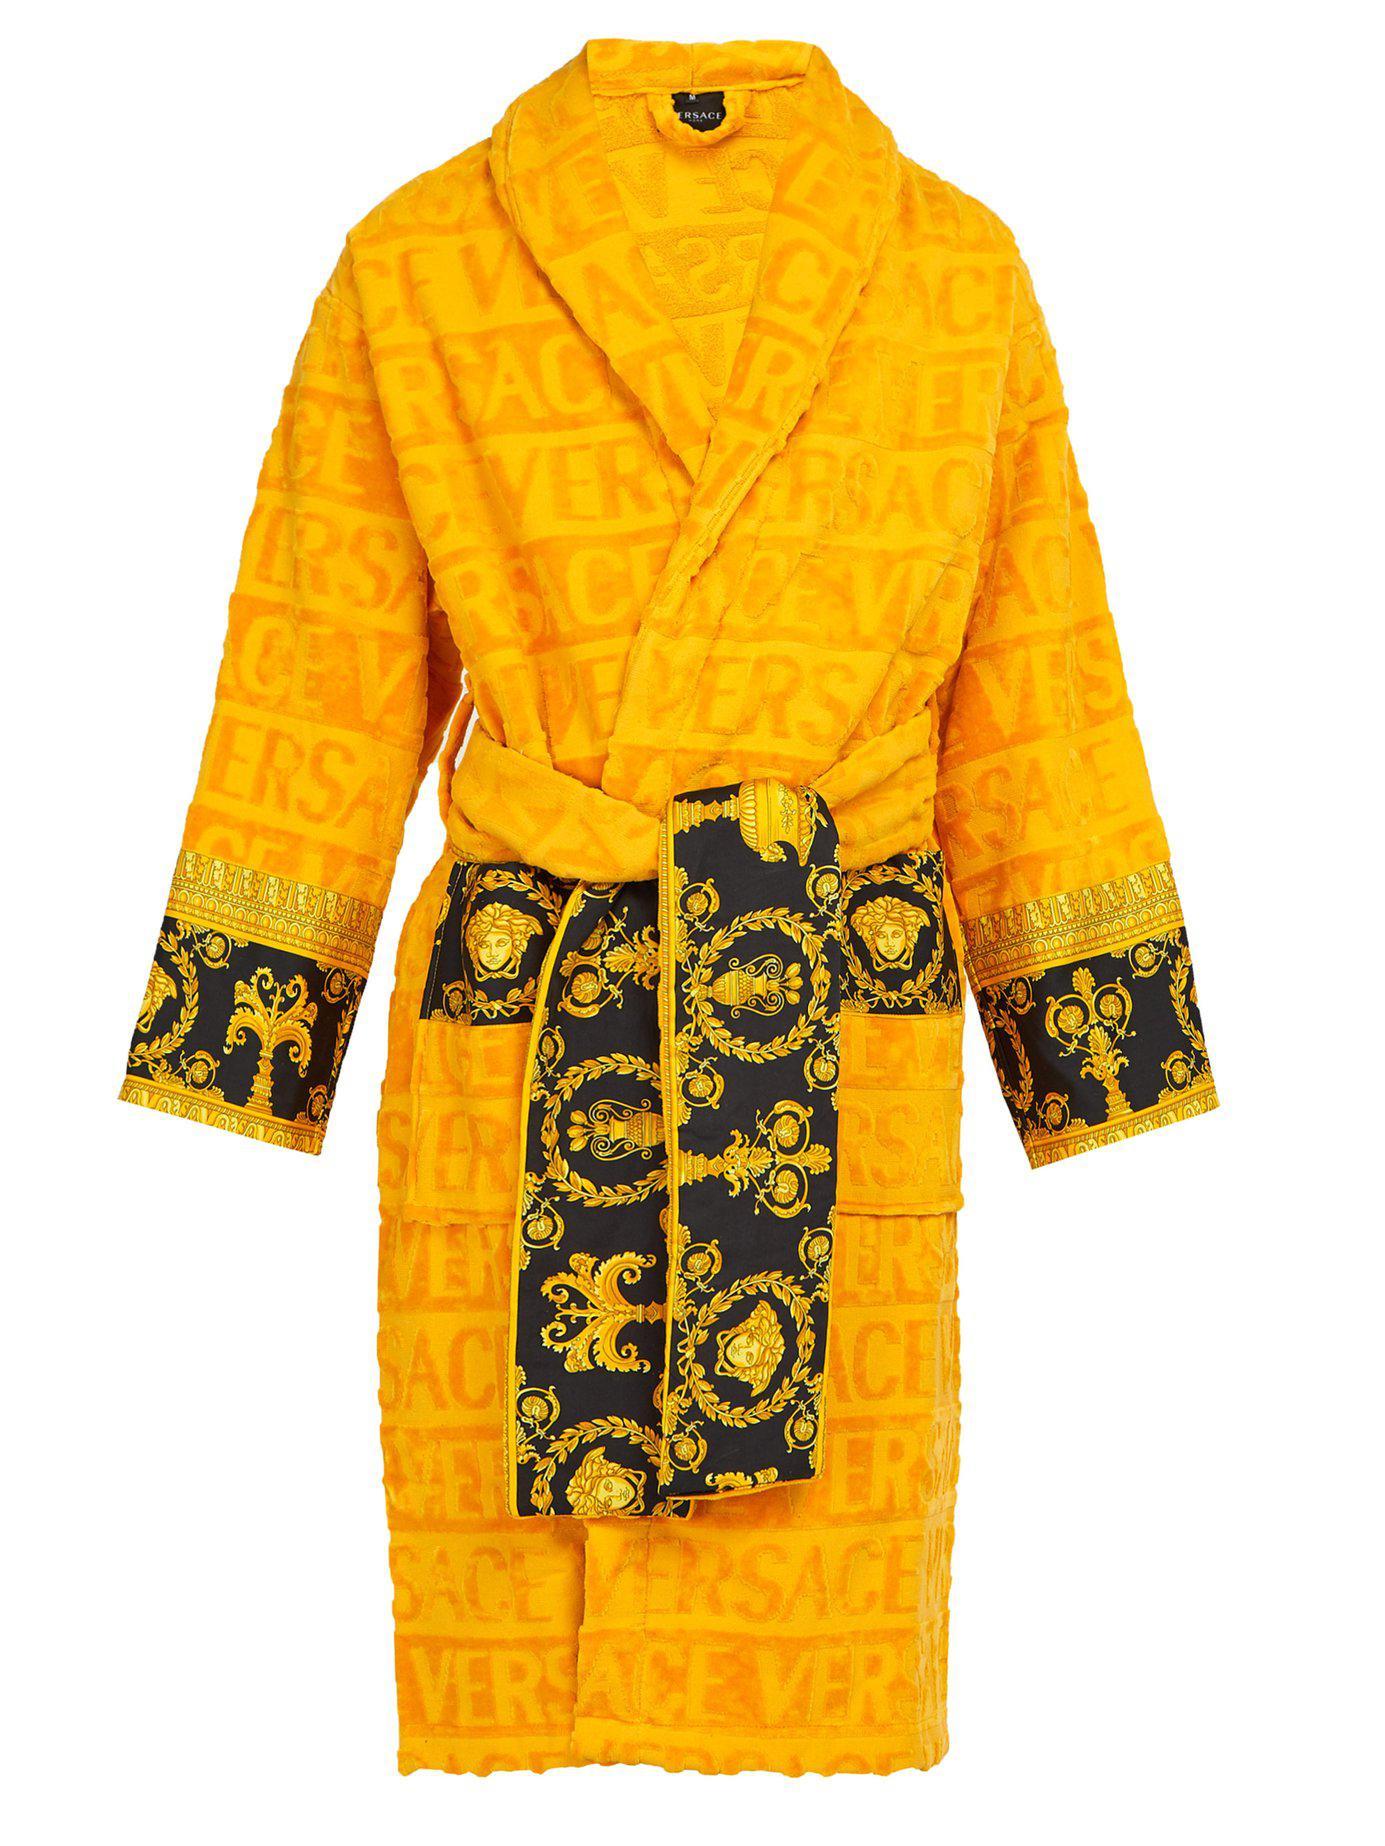 Lyst - Versace Print-panelled Logo-jacquard Cotton Bathrobe in ... 02bf96986